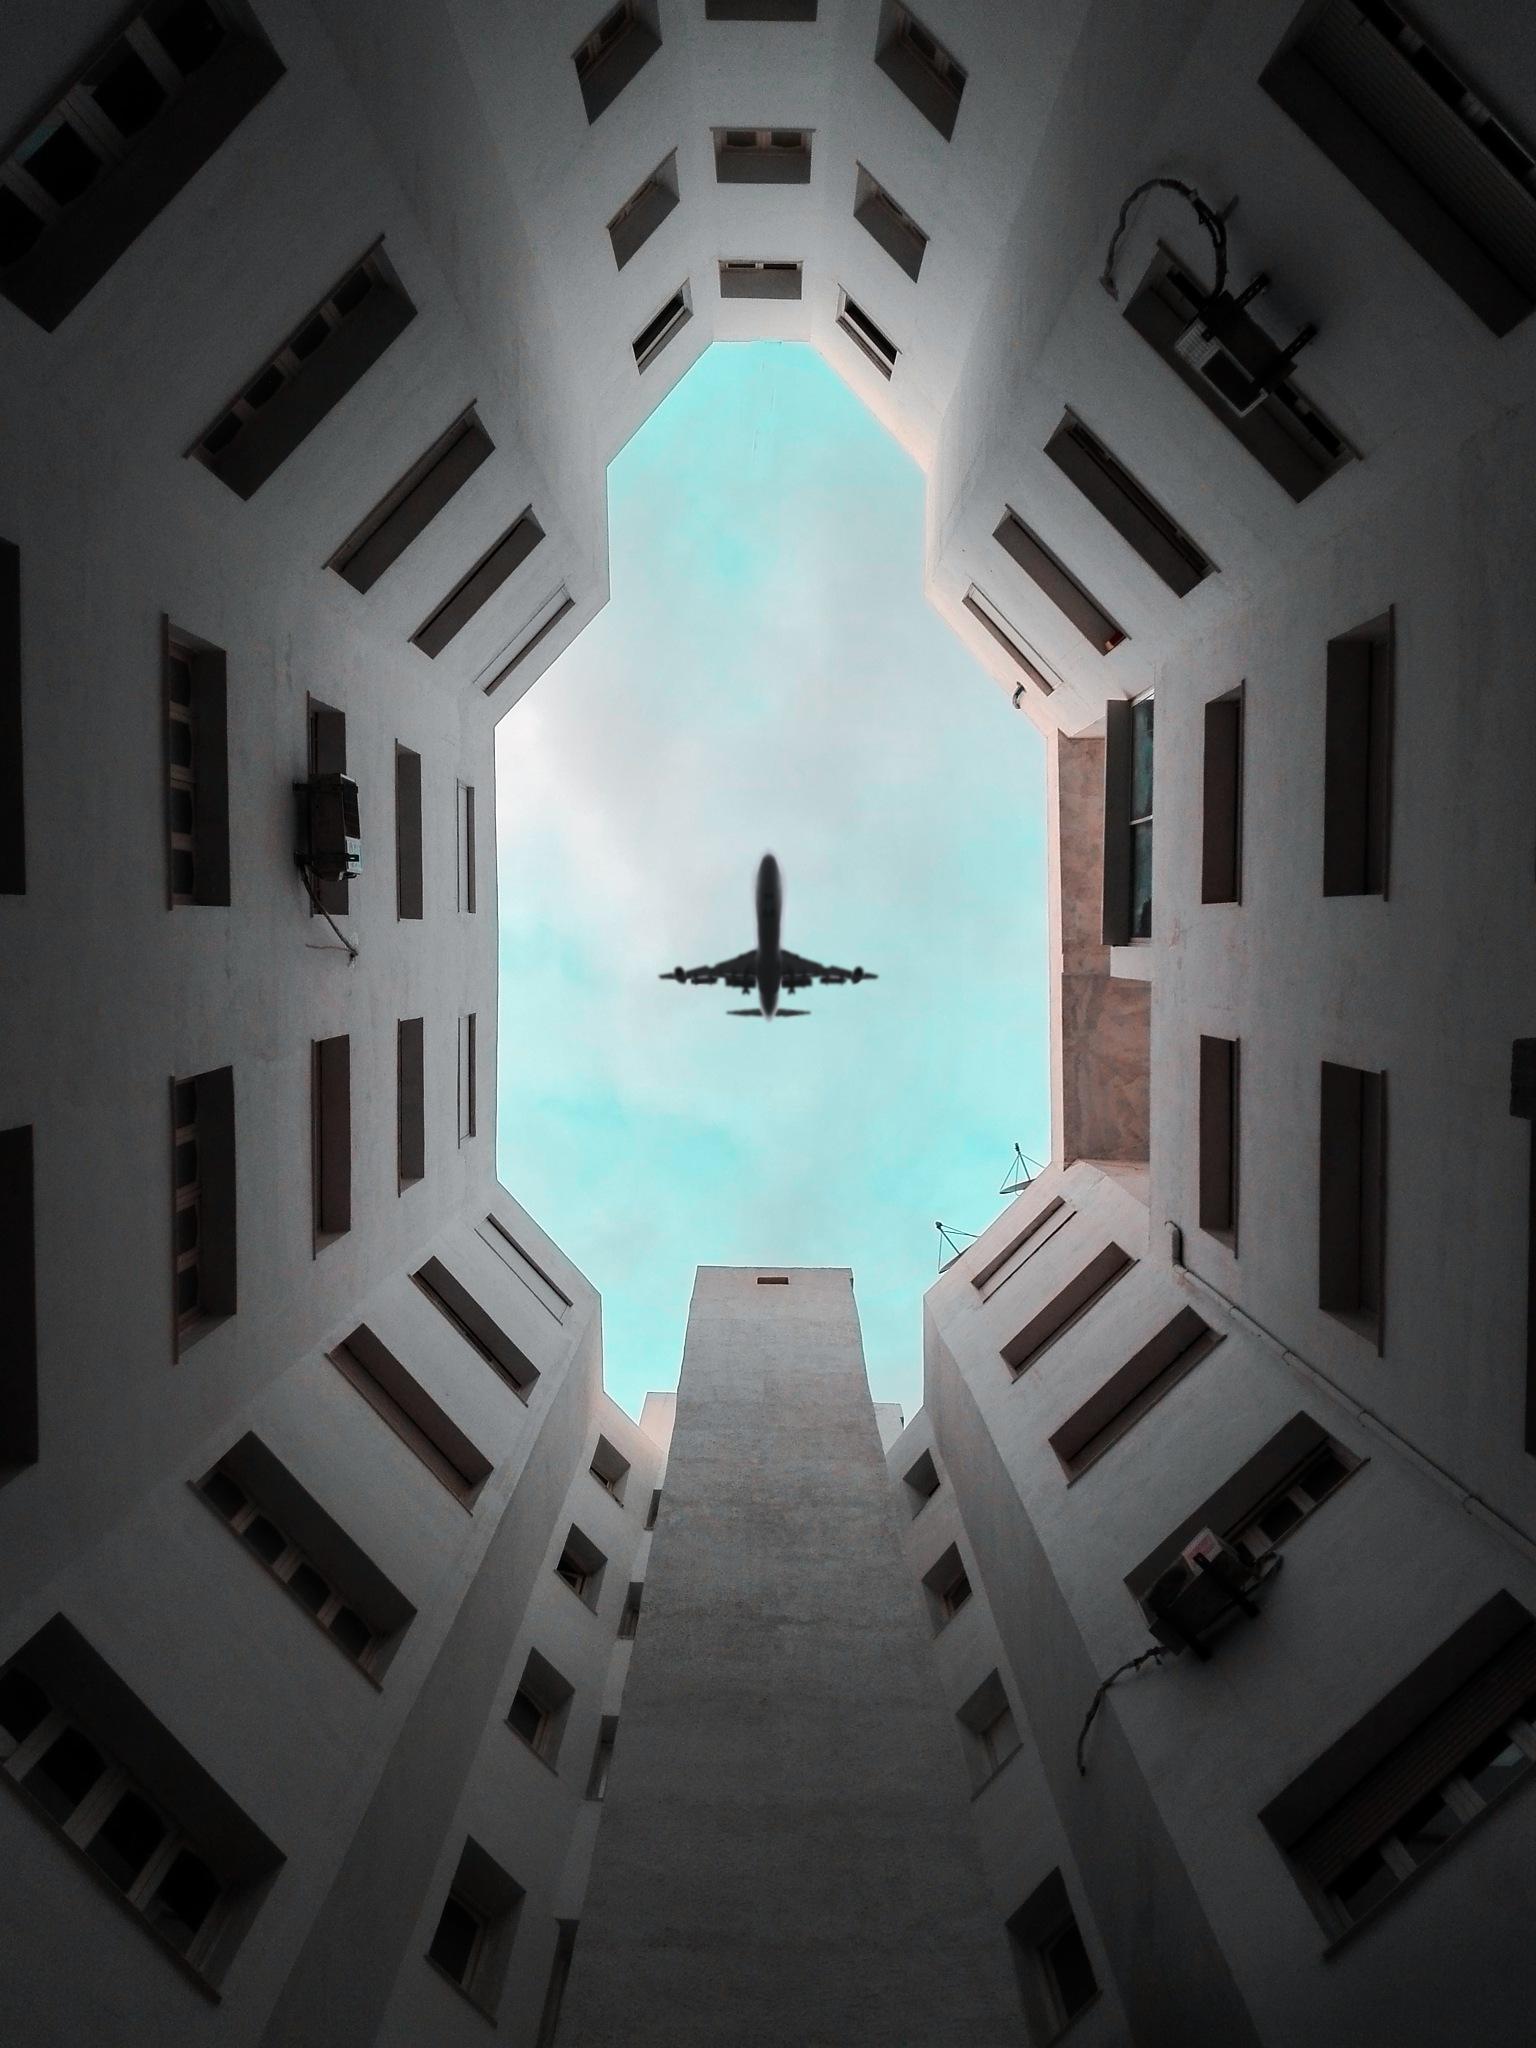 Untitled by aminearfaoui98